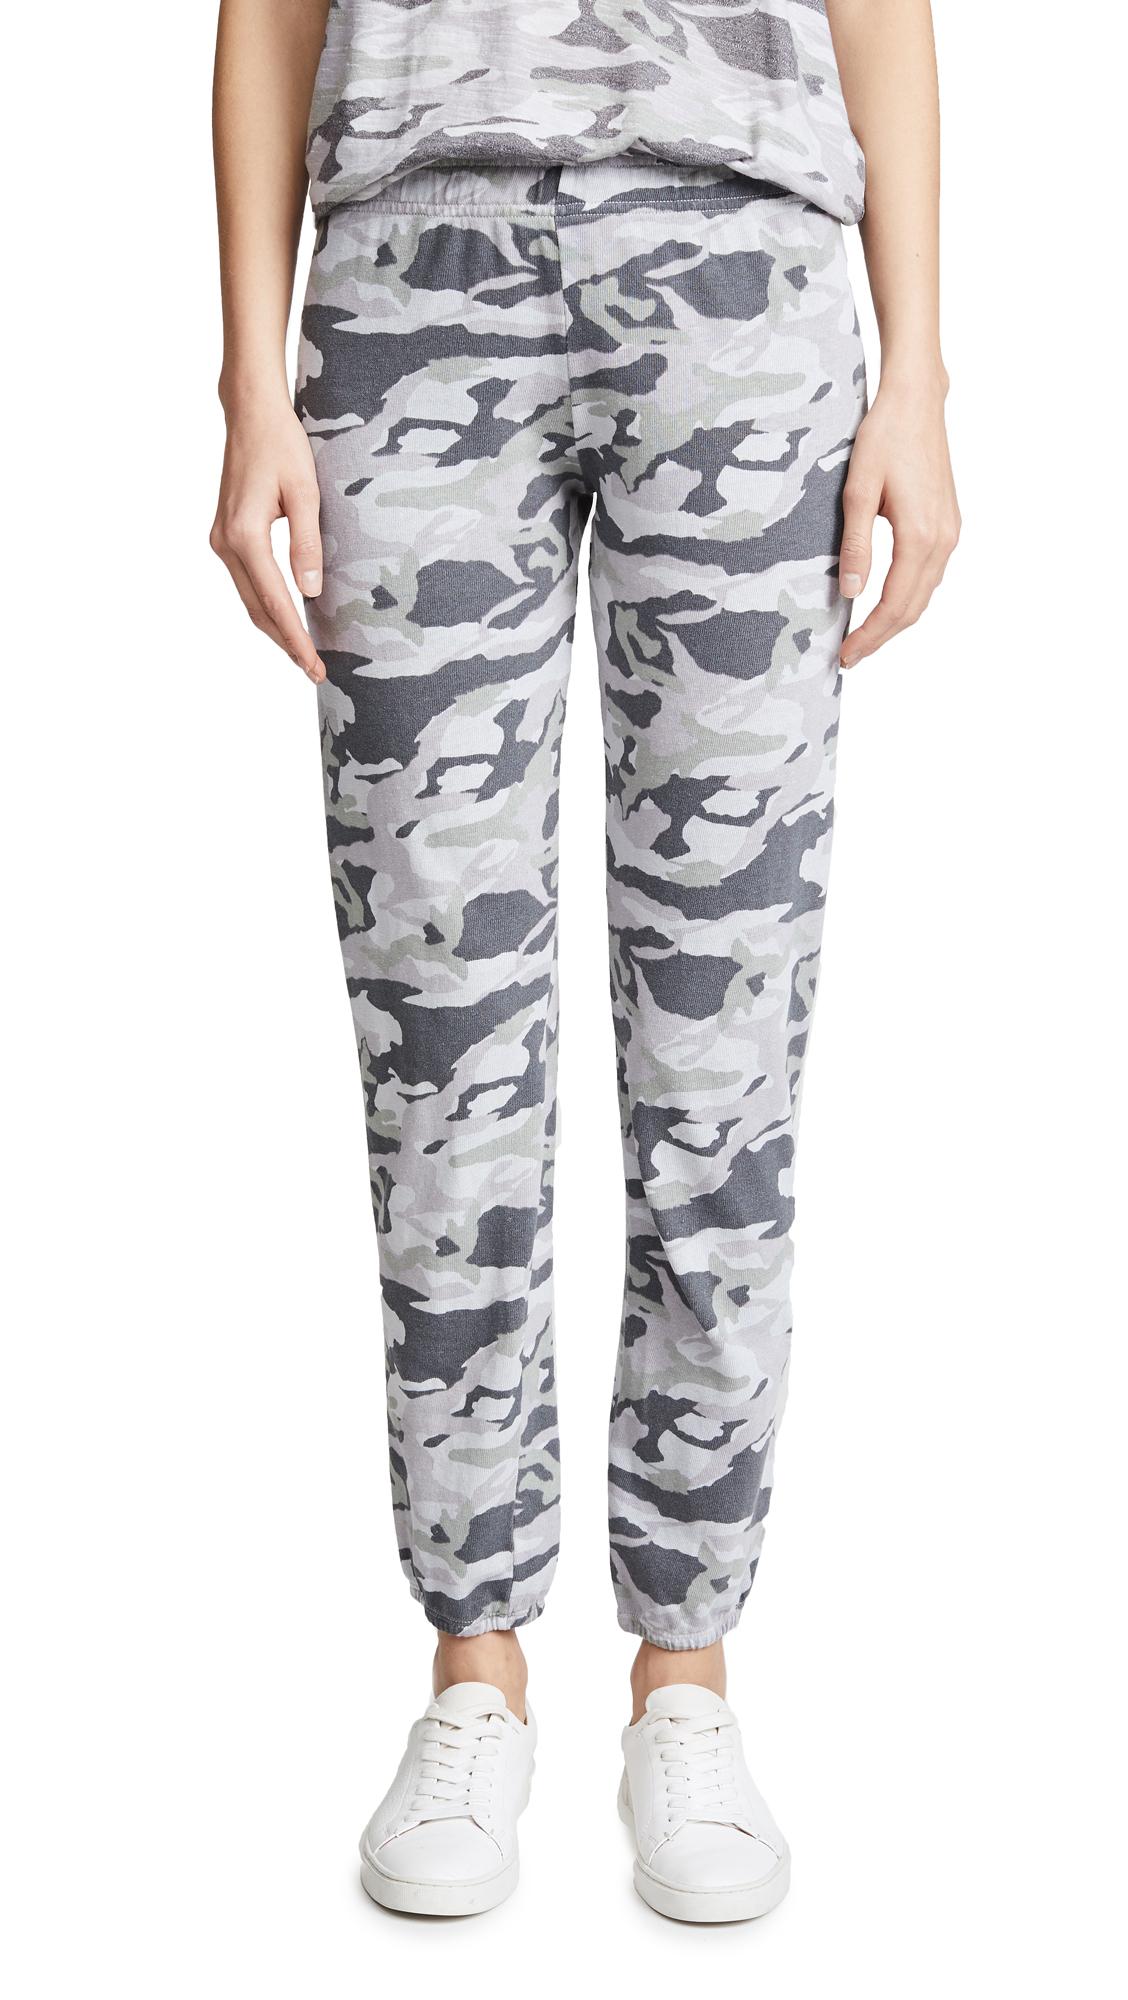 MONROW Camo Sweatpants